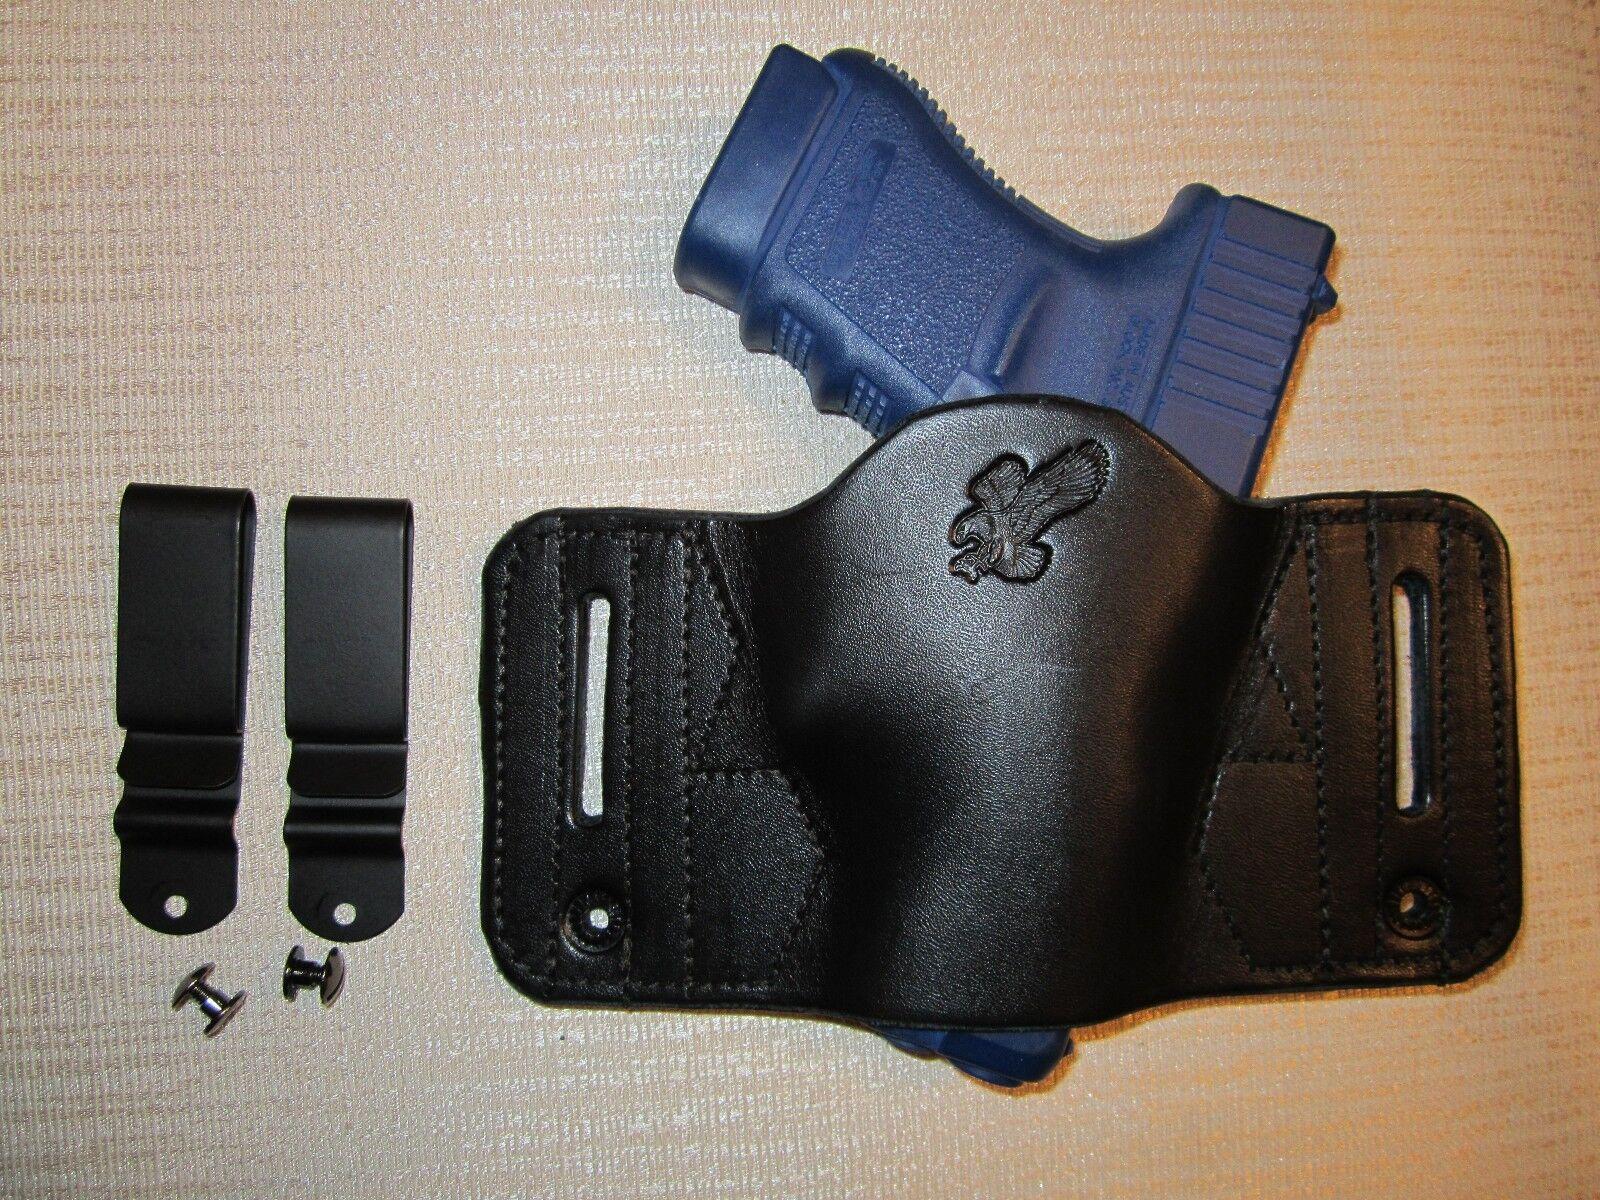 FITS GUNS WITHOUT LASERS, AMB. & UNIVERSAL FIT. IWB & OWB,PANCAKE SLIDE HOLSTER